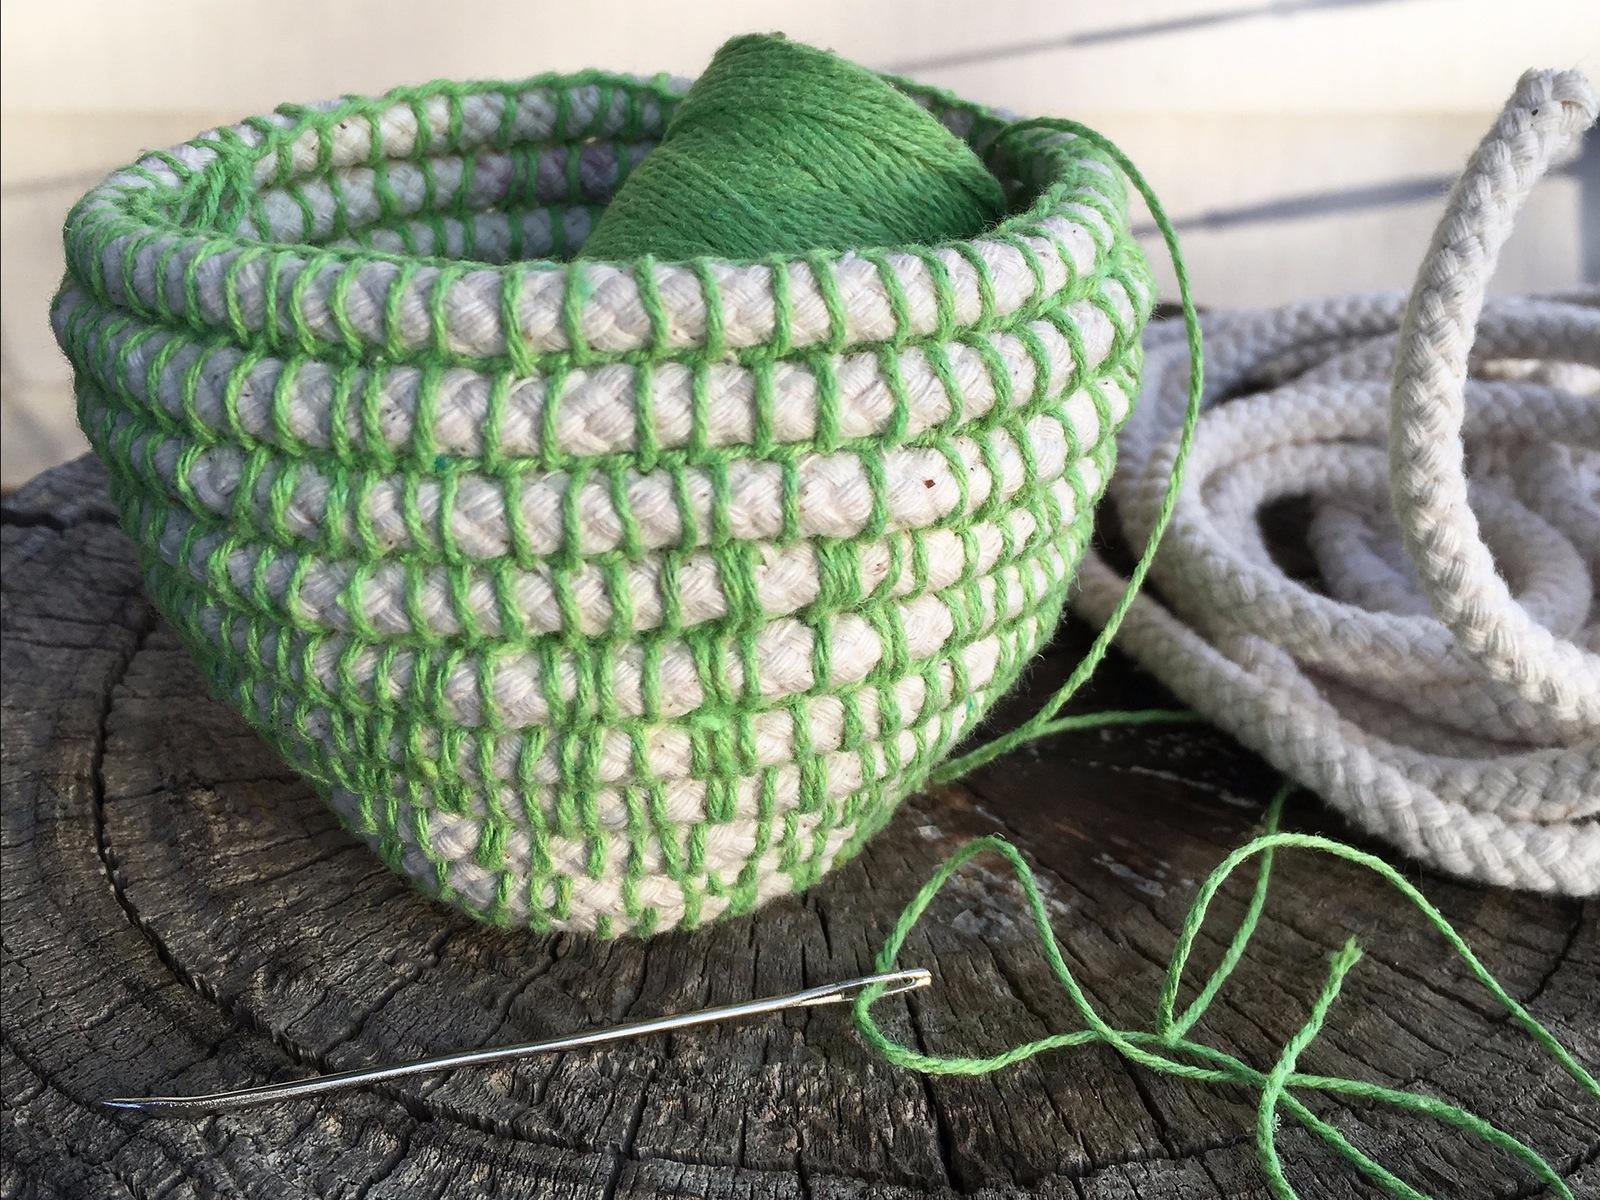 Beechworth Lost Arts Series - MYO Coil Baskets with Morning Tea